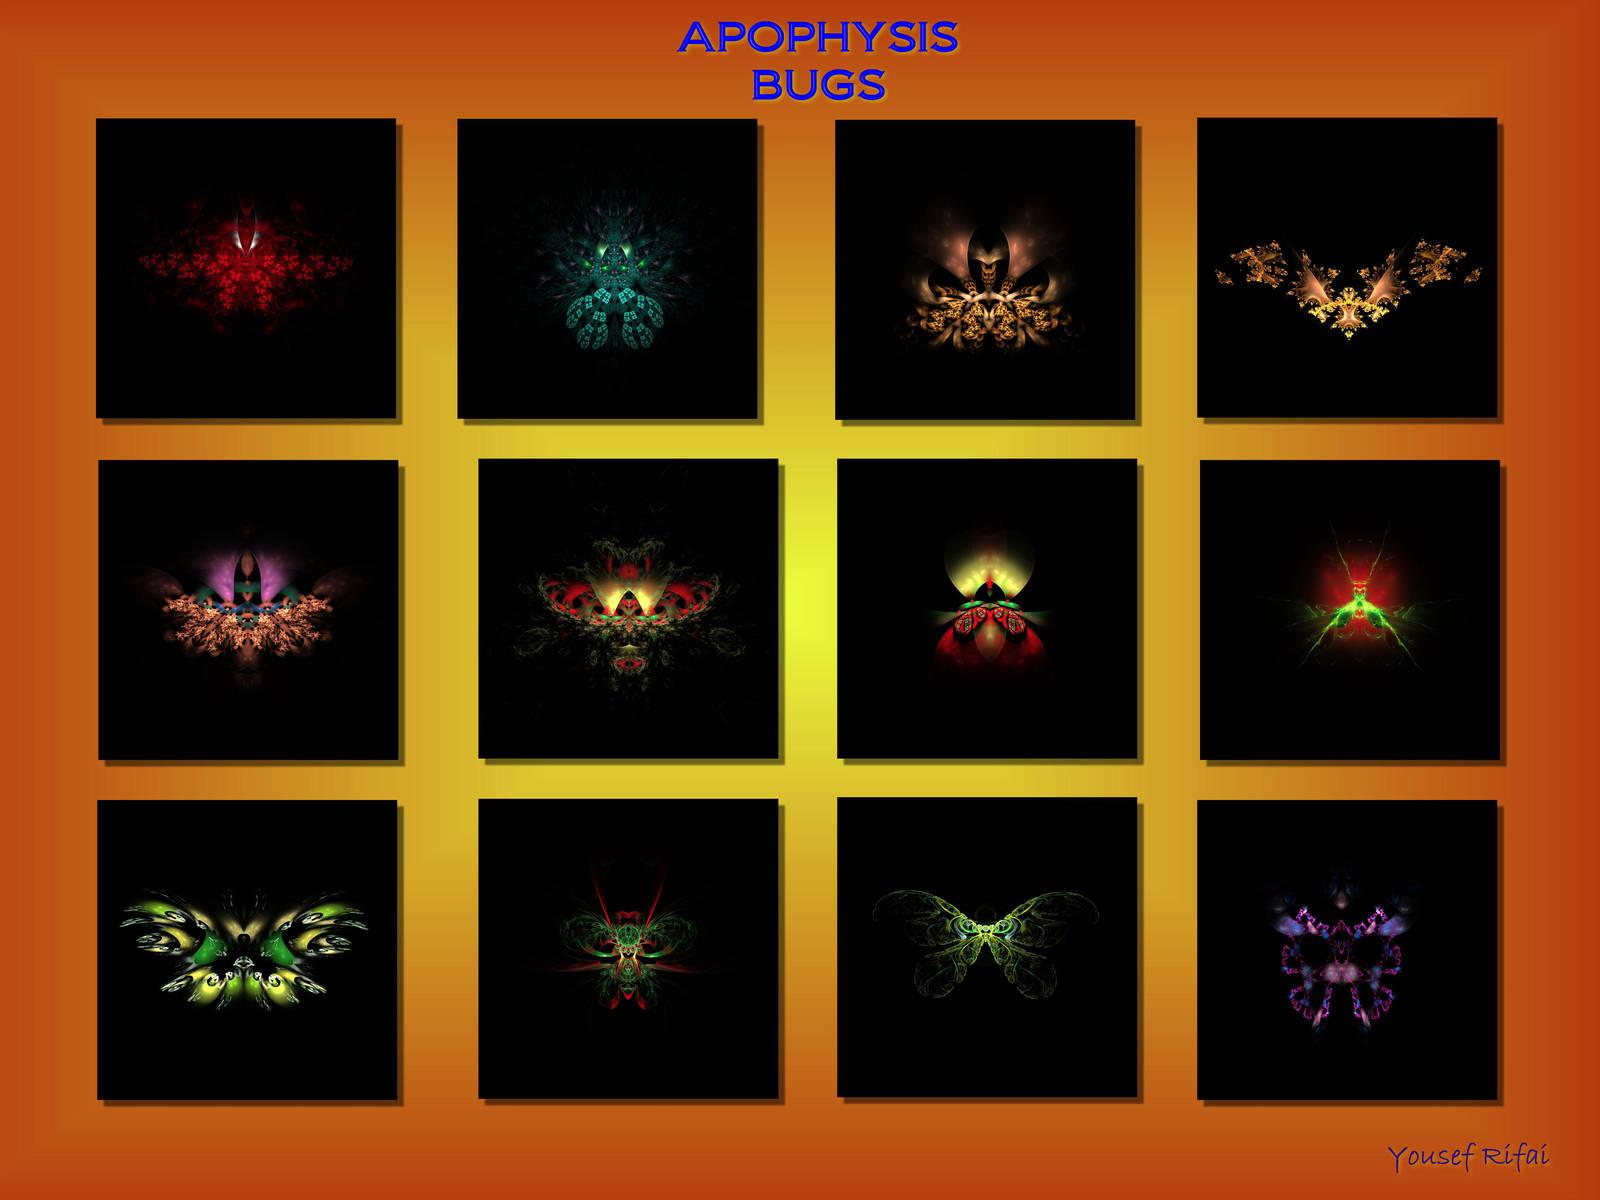 Apophysis bug print by shineout-fractals